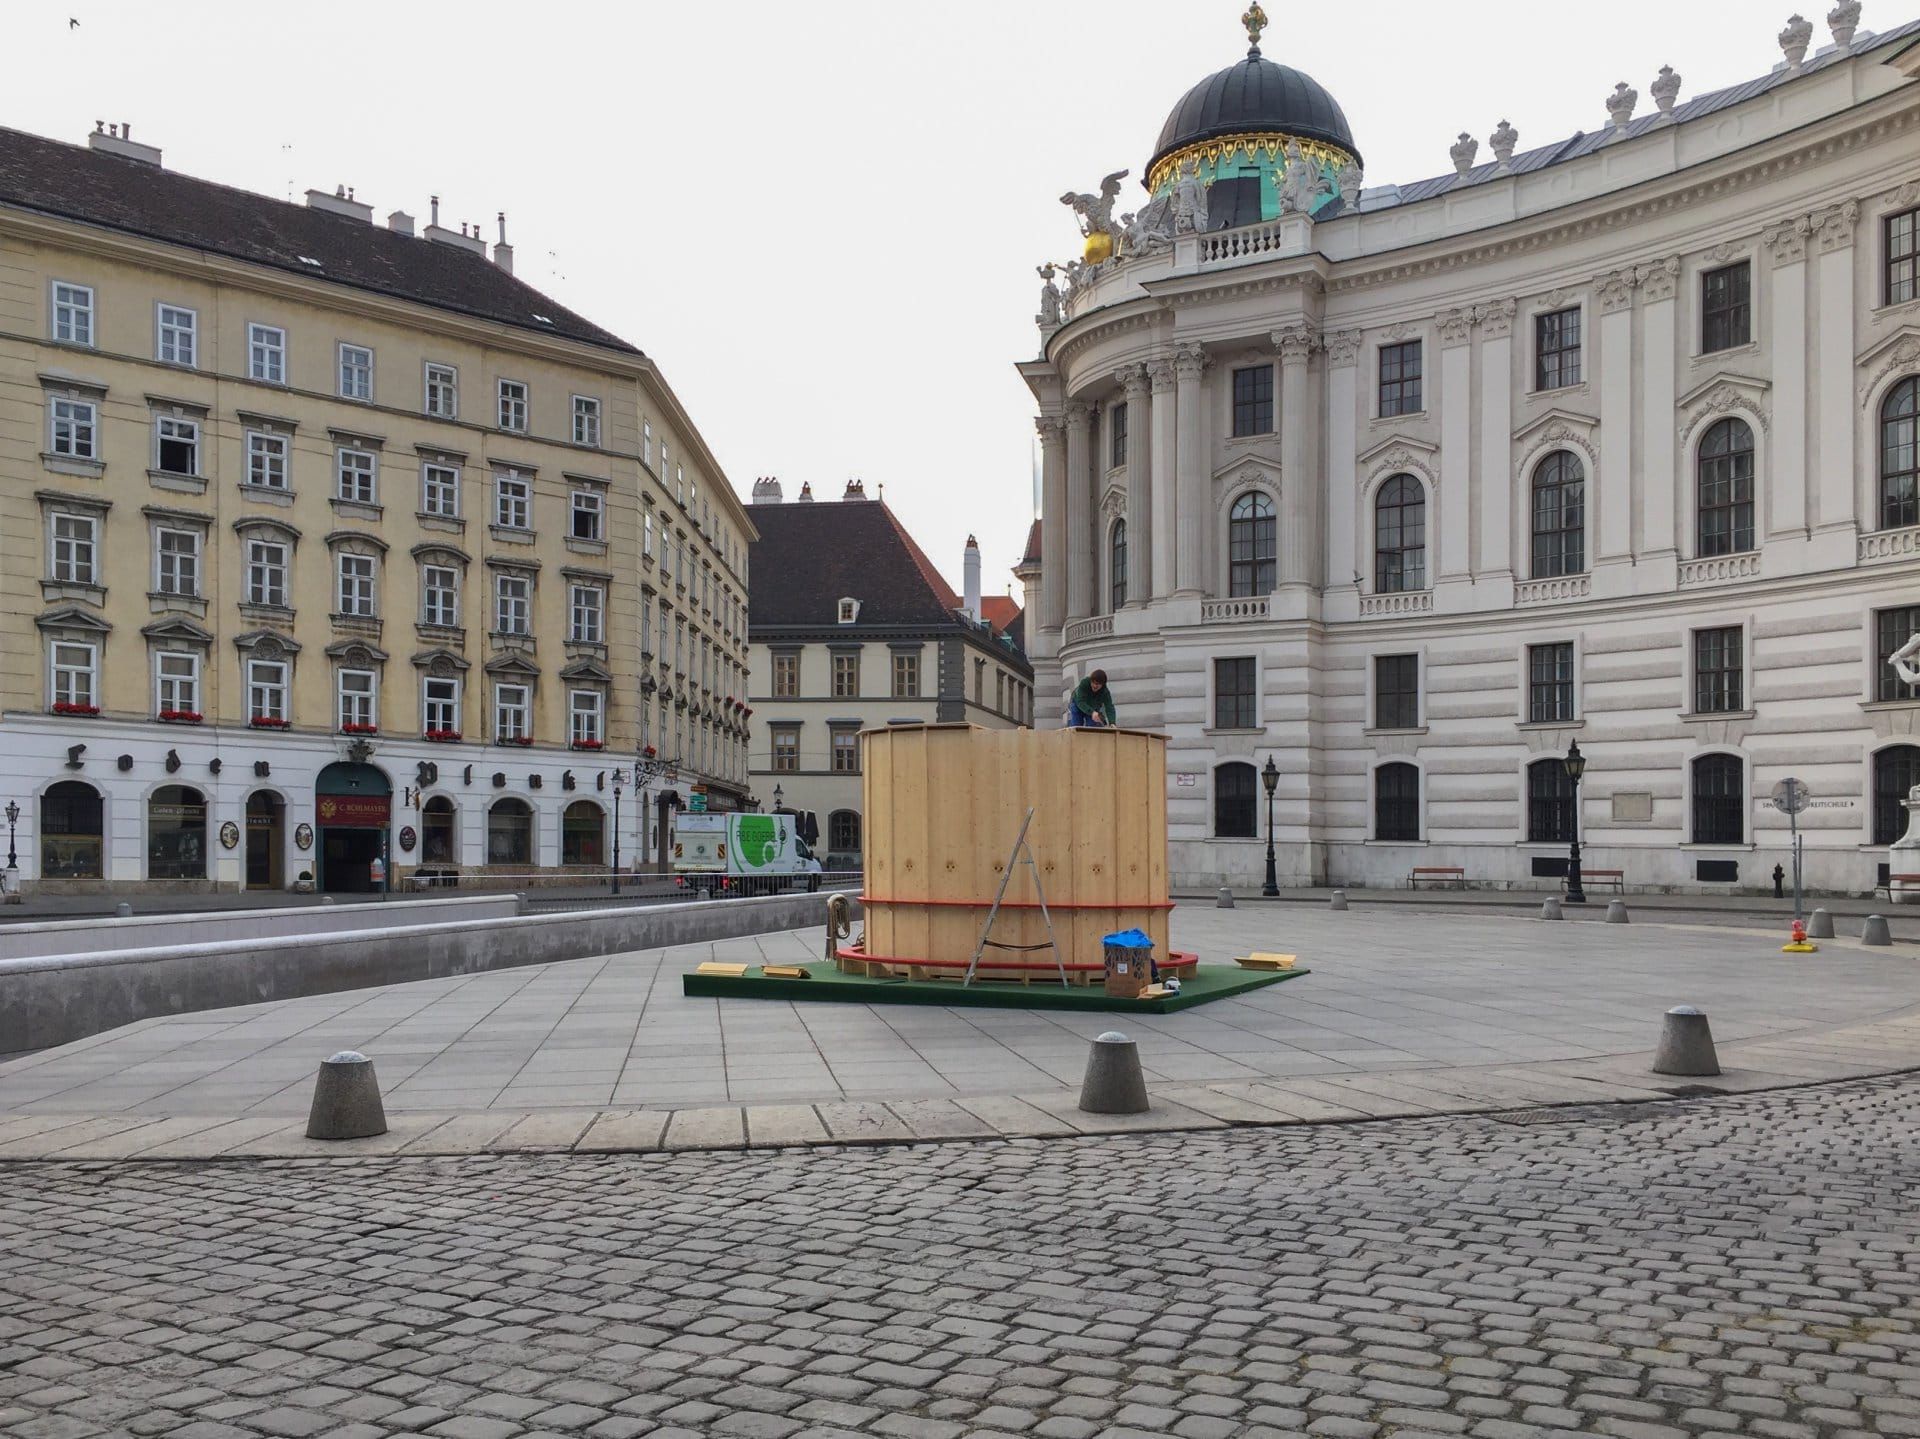 2016 09 26 michaelaplatz